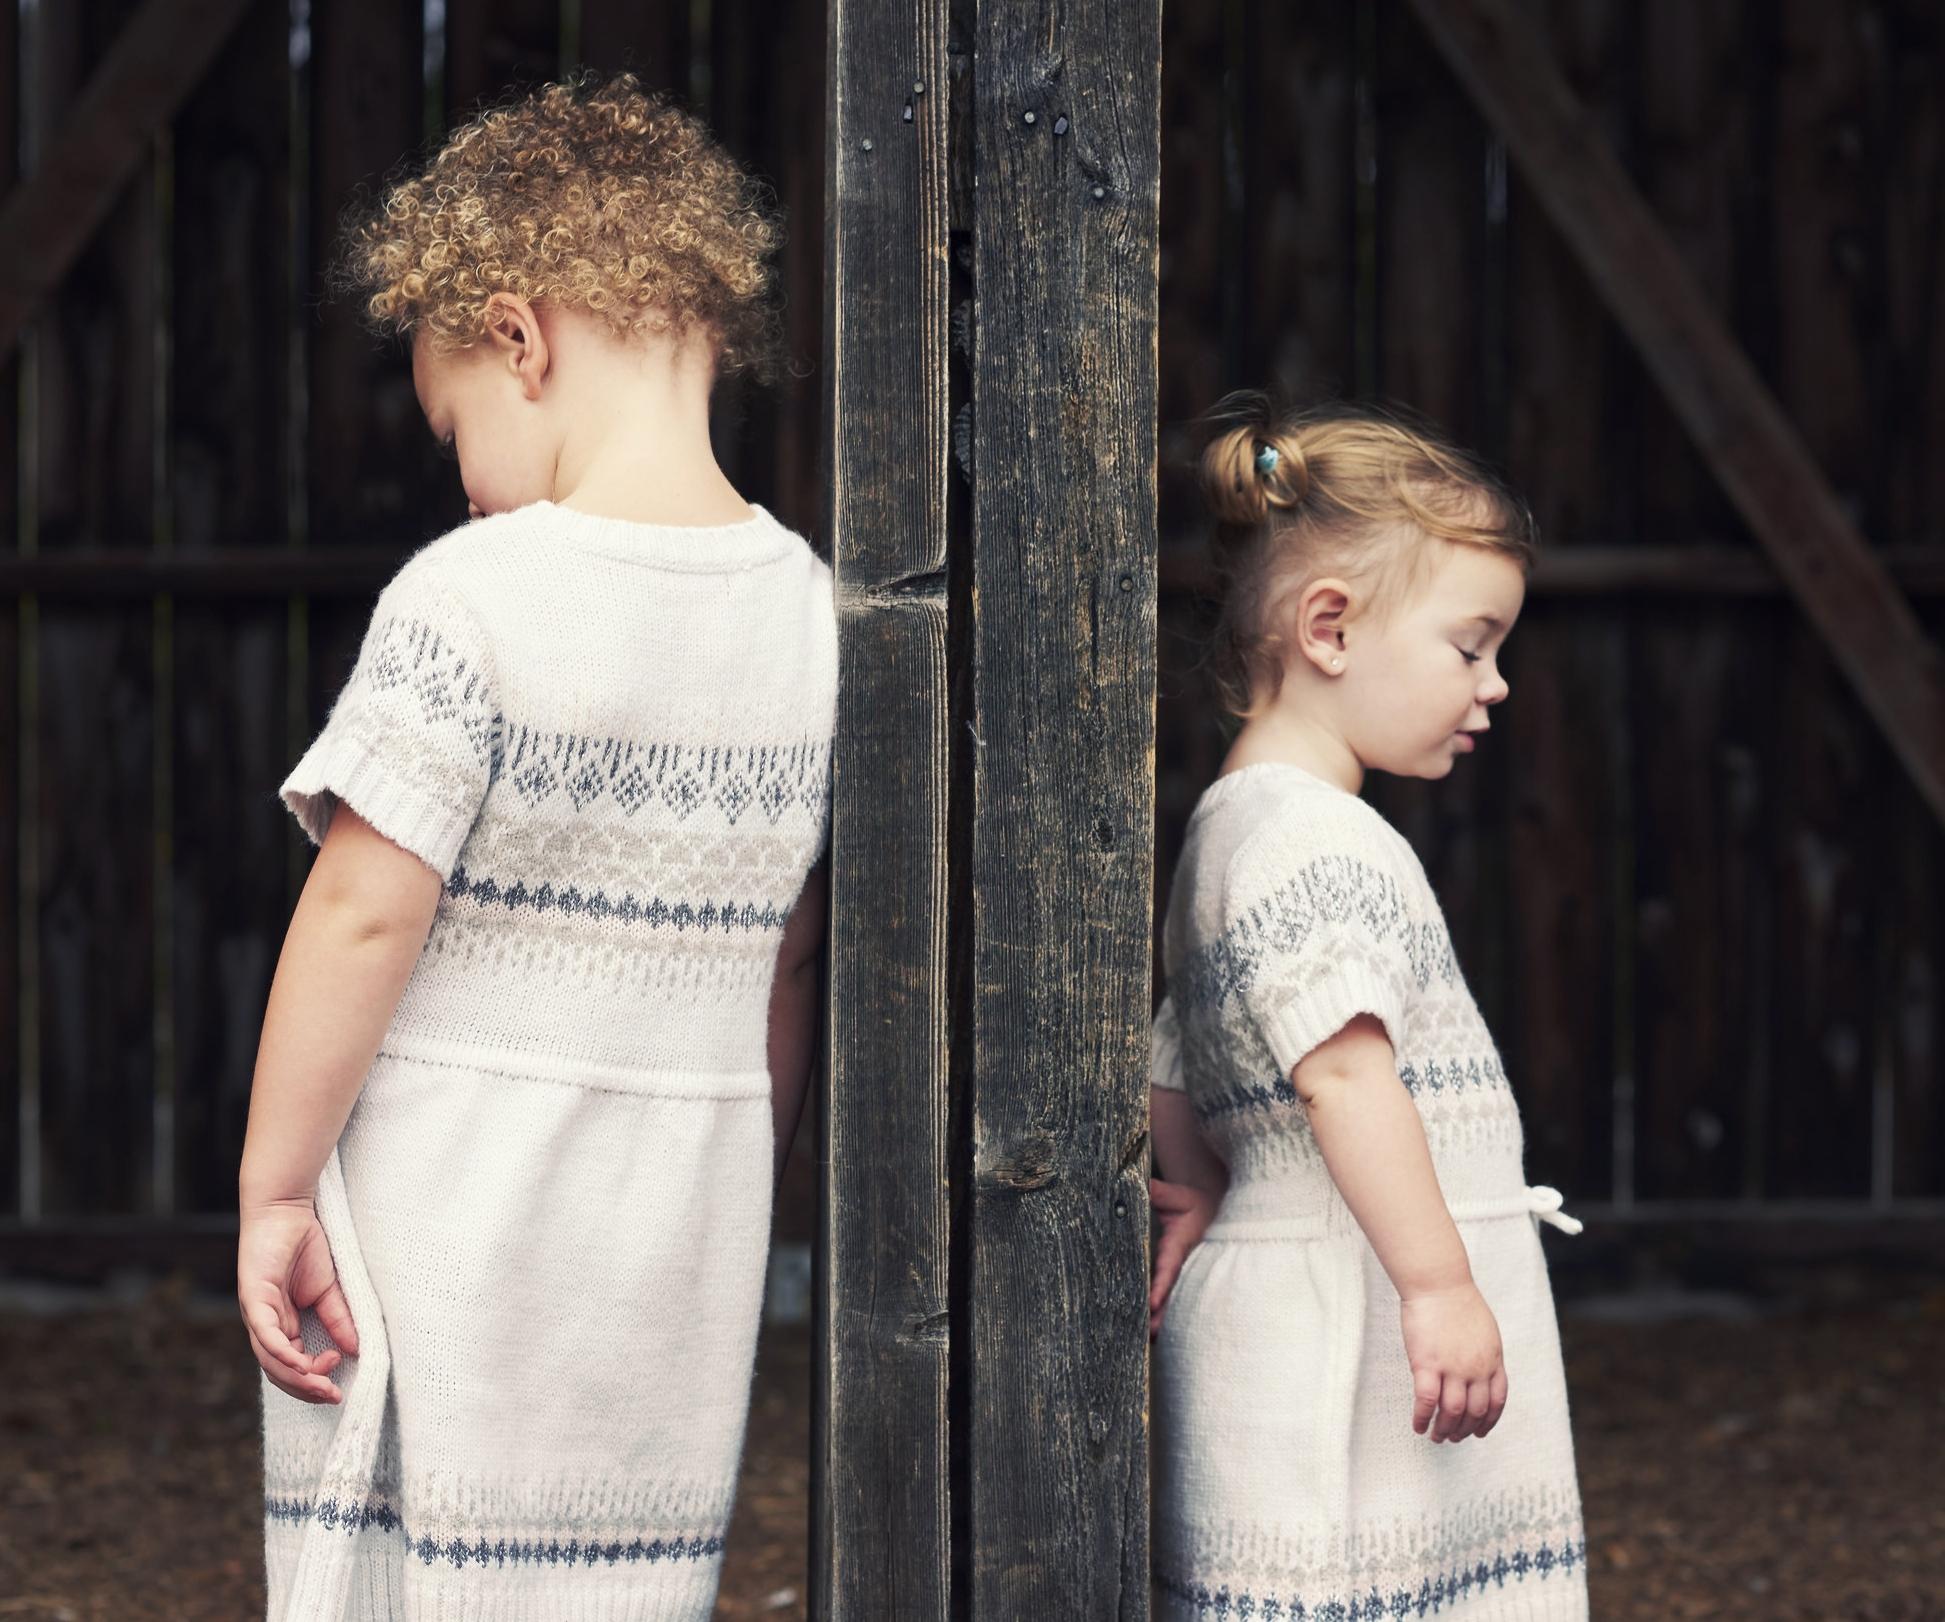 Lifestyle-Portraits-Marta-Hewson-sisters.jpg